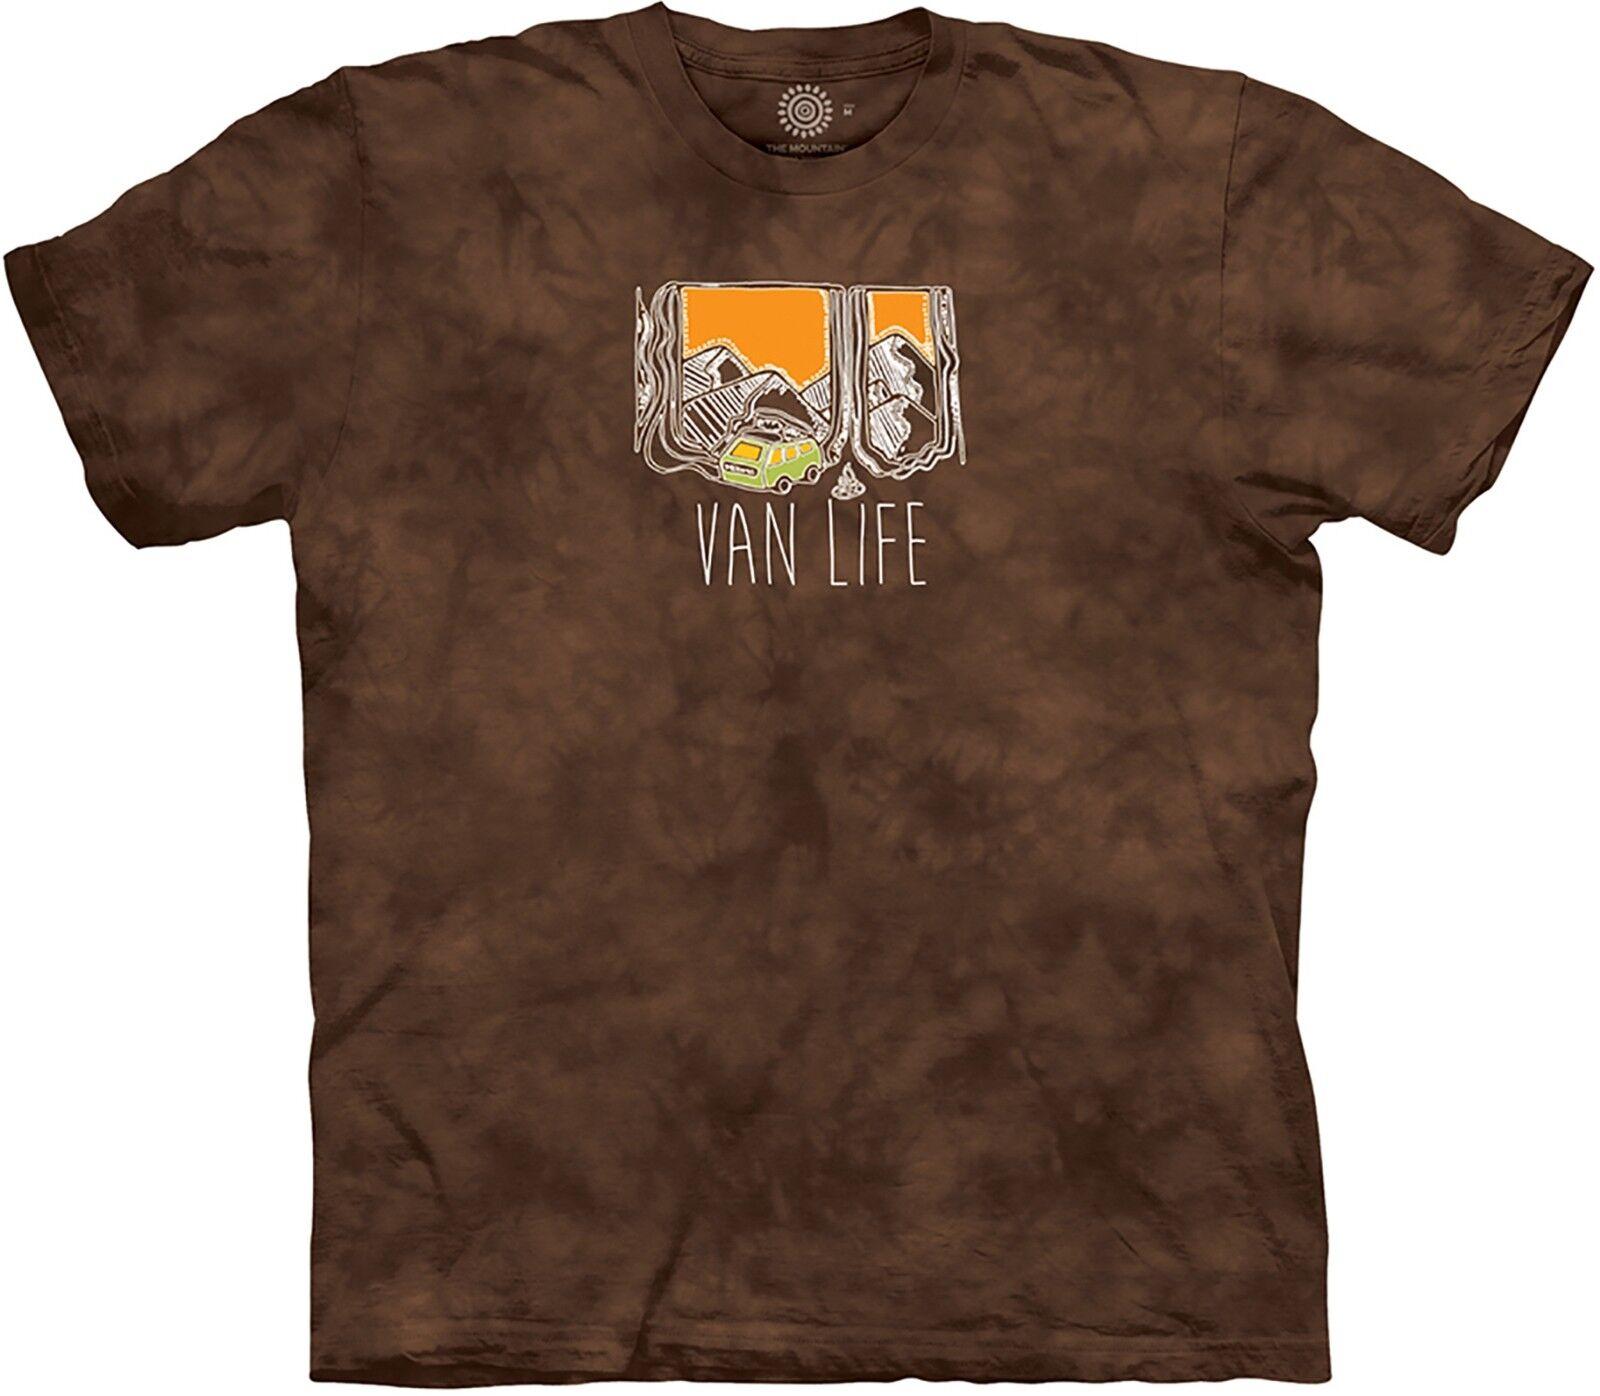 The Mountain Unisex Adult Van Life MT Life Outdoor T Shirt